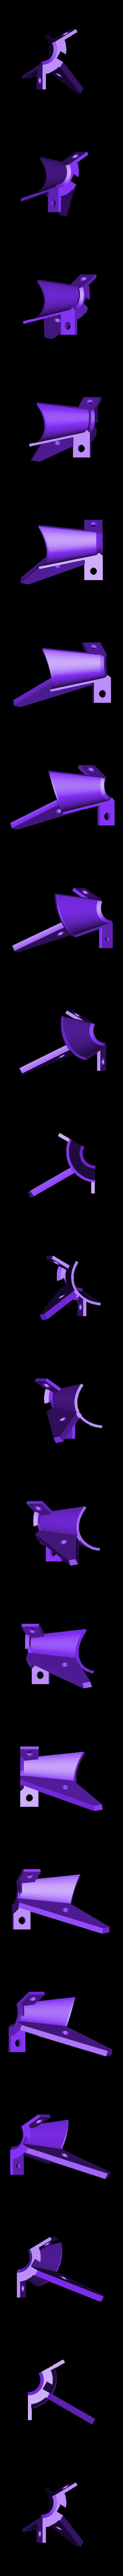 tetrapod_tank_trap-mold_open_v5.STL Download free STL file  Concrete obstacles • 3D printable model, Steyrc